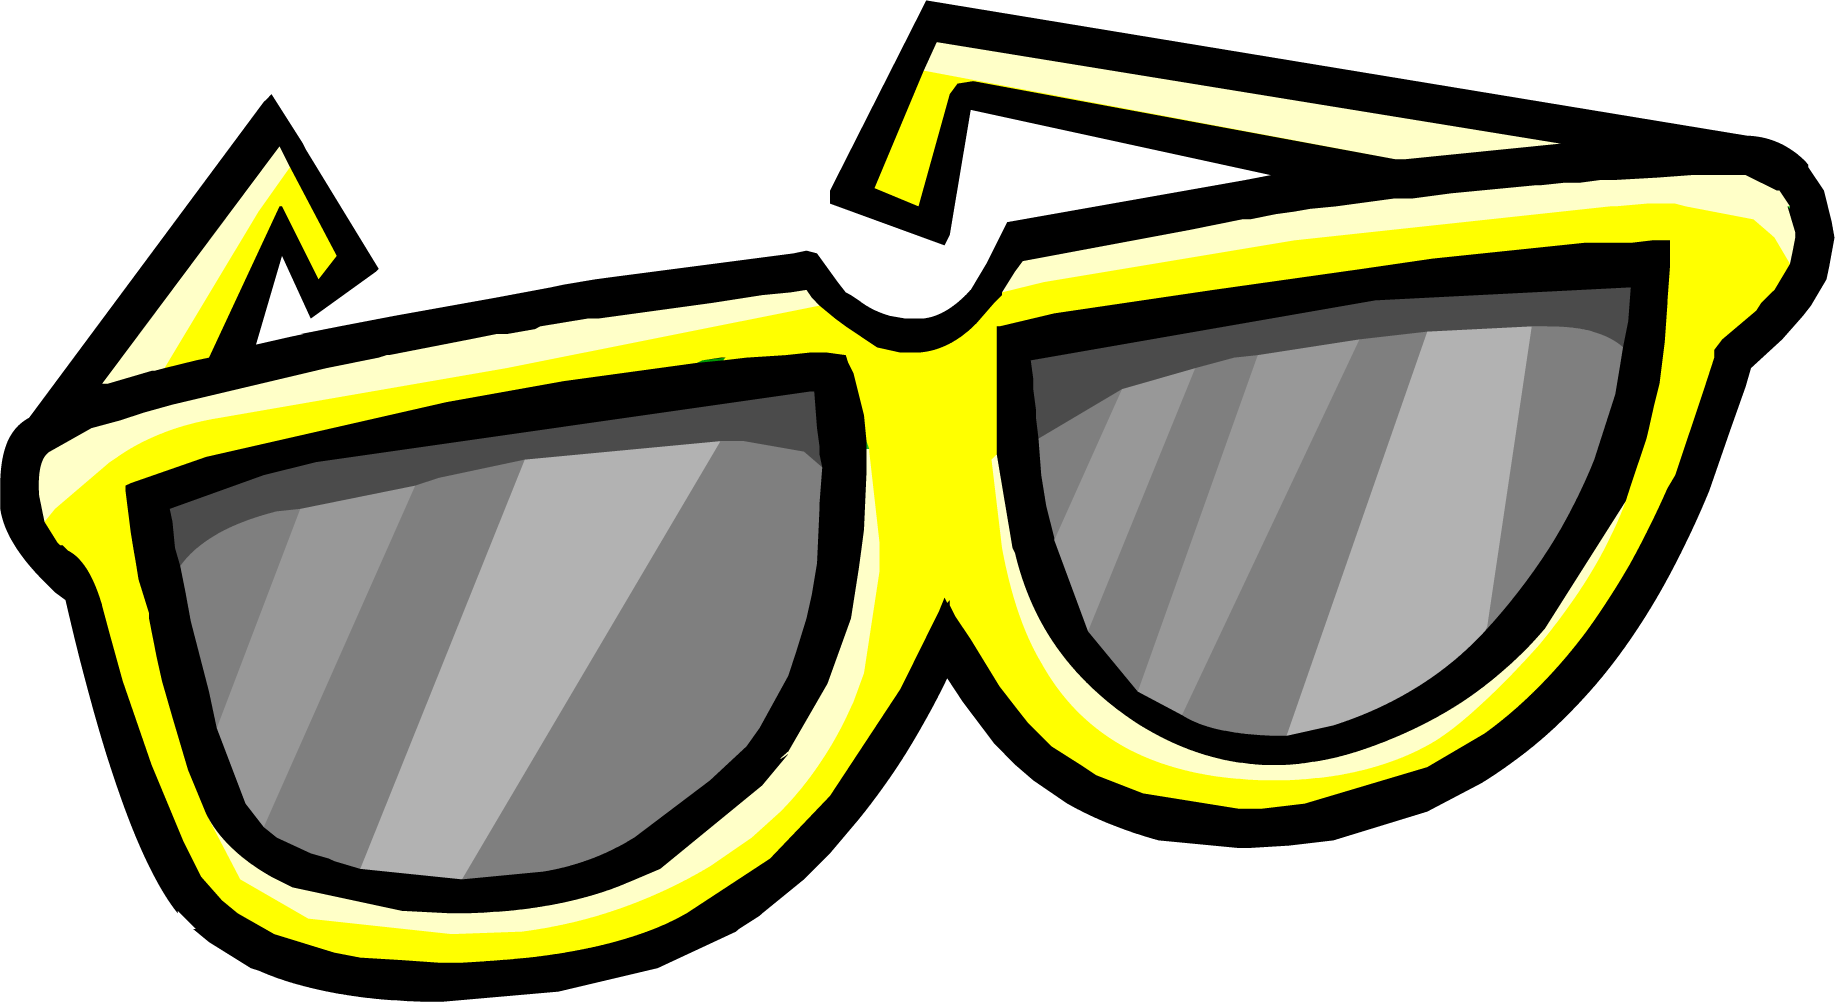 Sun glasses clipart clip art freeuse stock Yellow Giant Sunglasses | Club Penguin Wiki | FANDOM powered by Wikia clip art freeuse stock